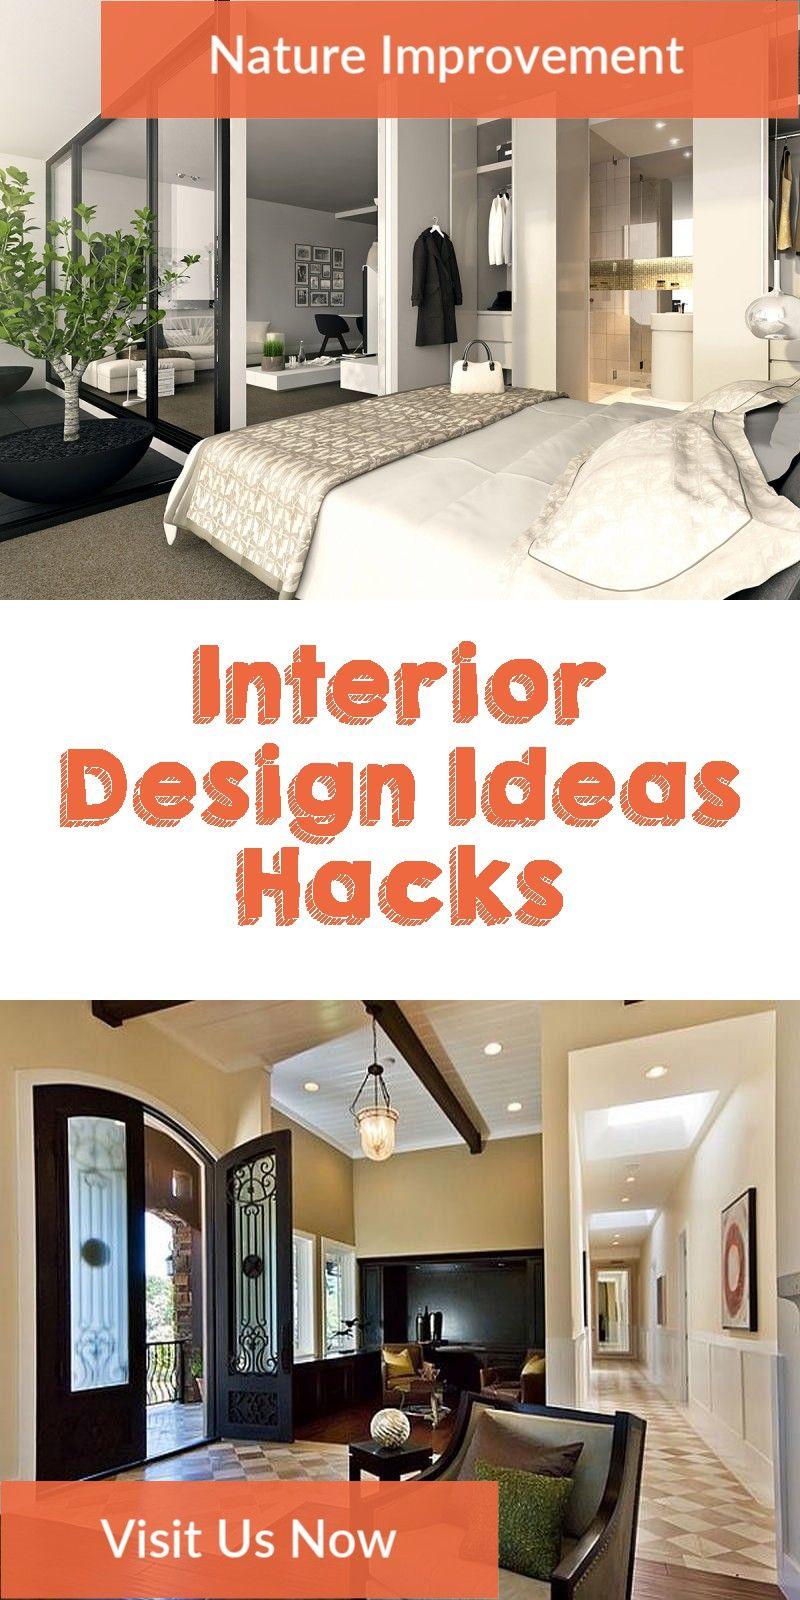 Interior Design Ideas Tips And Techniques For Beautiful Interior